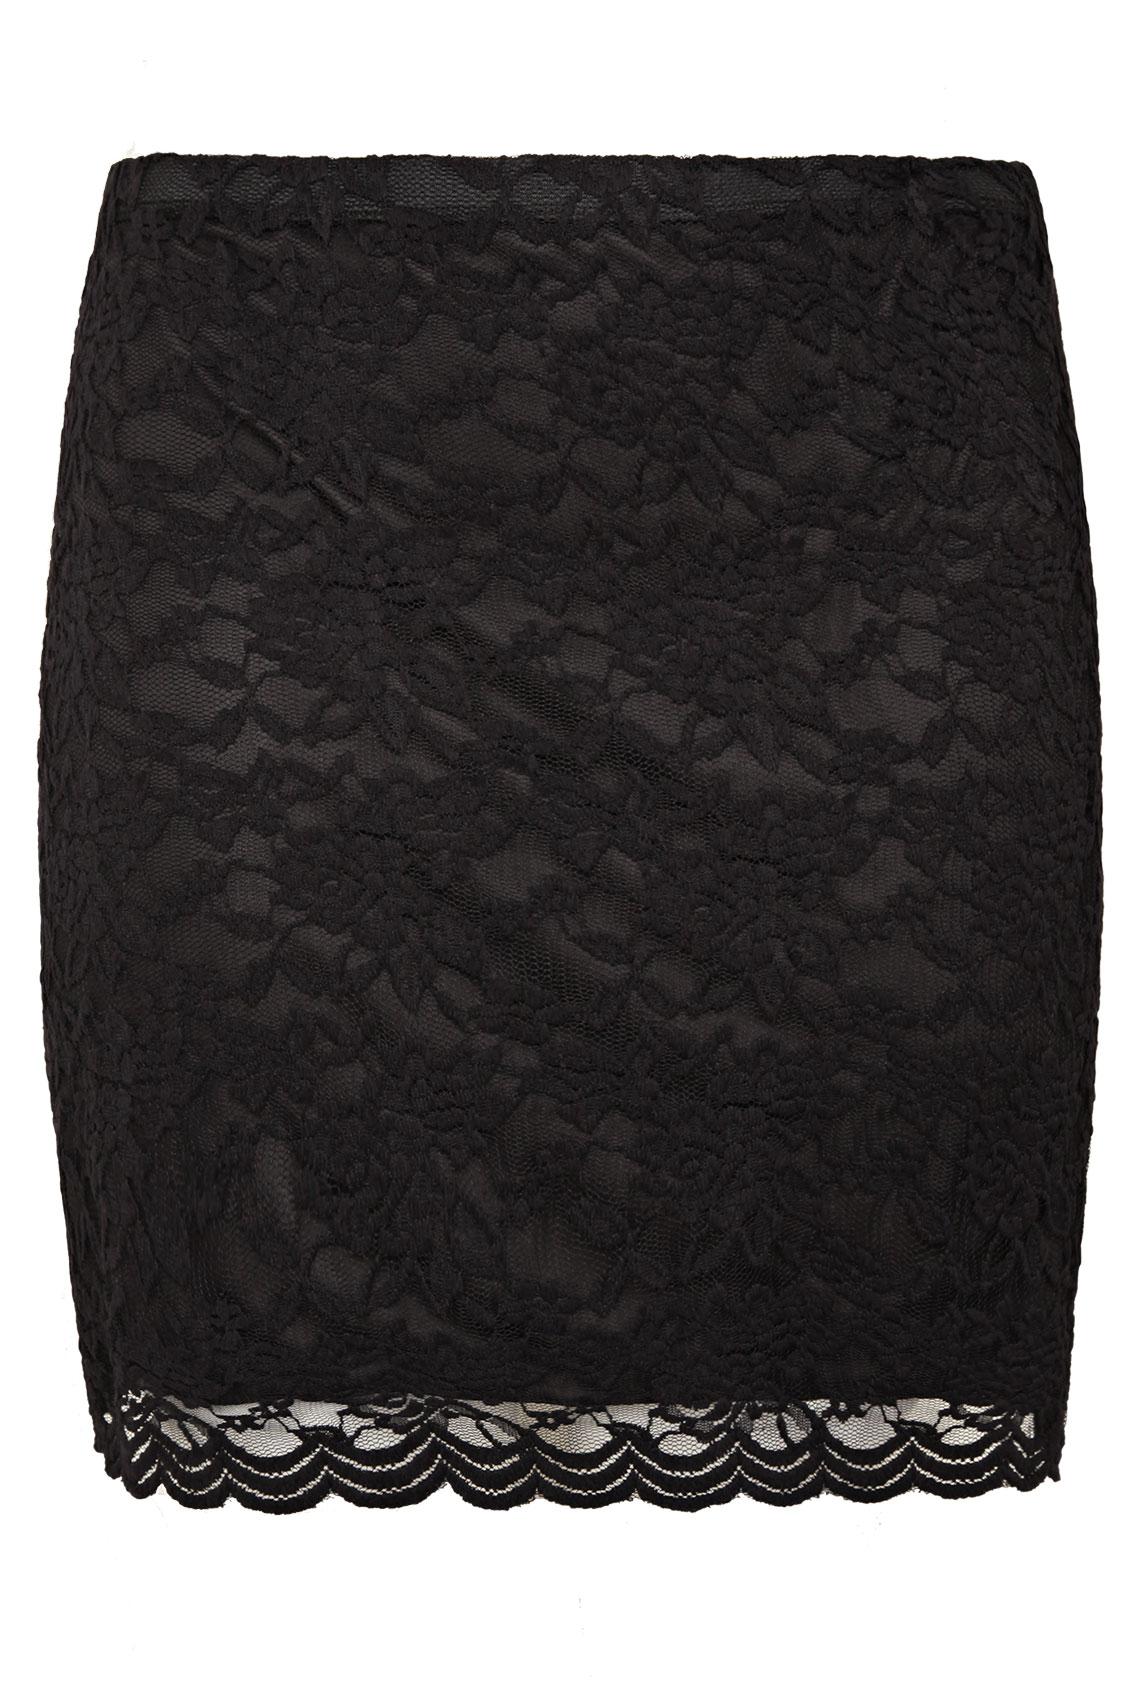 black lace skirt black lace pull on short stretch skirt YSVOBSH